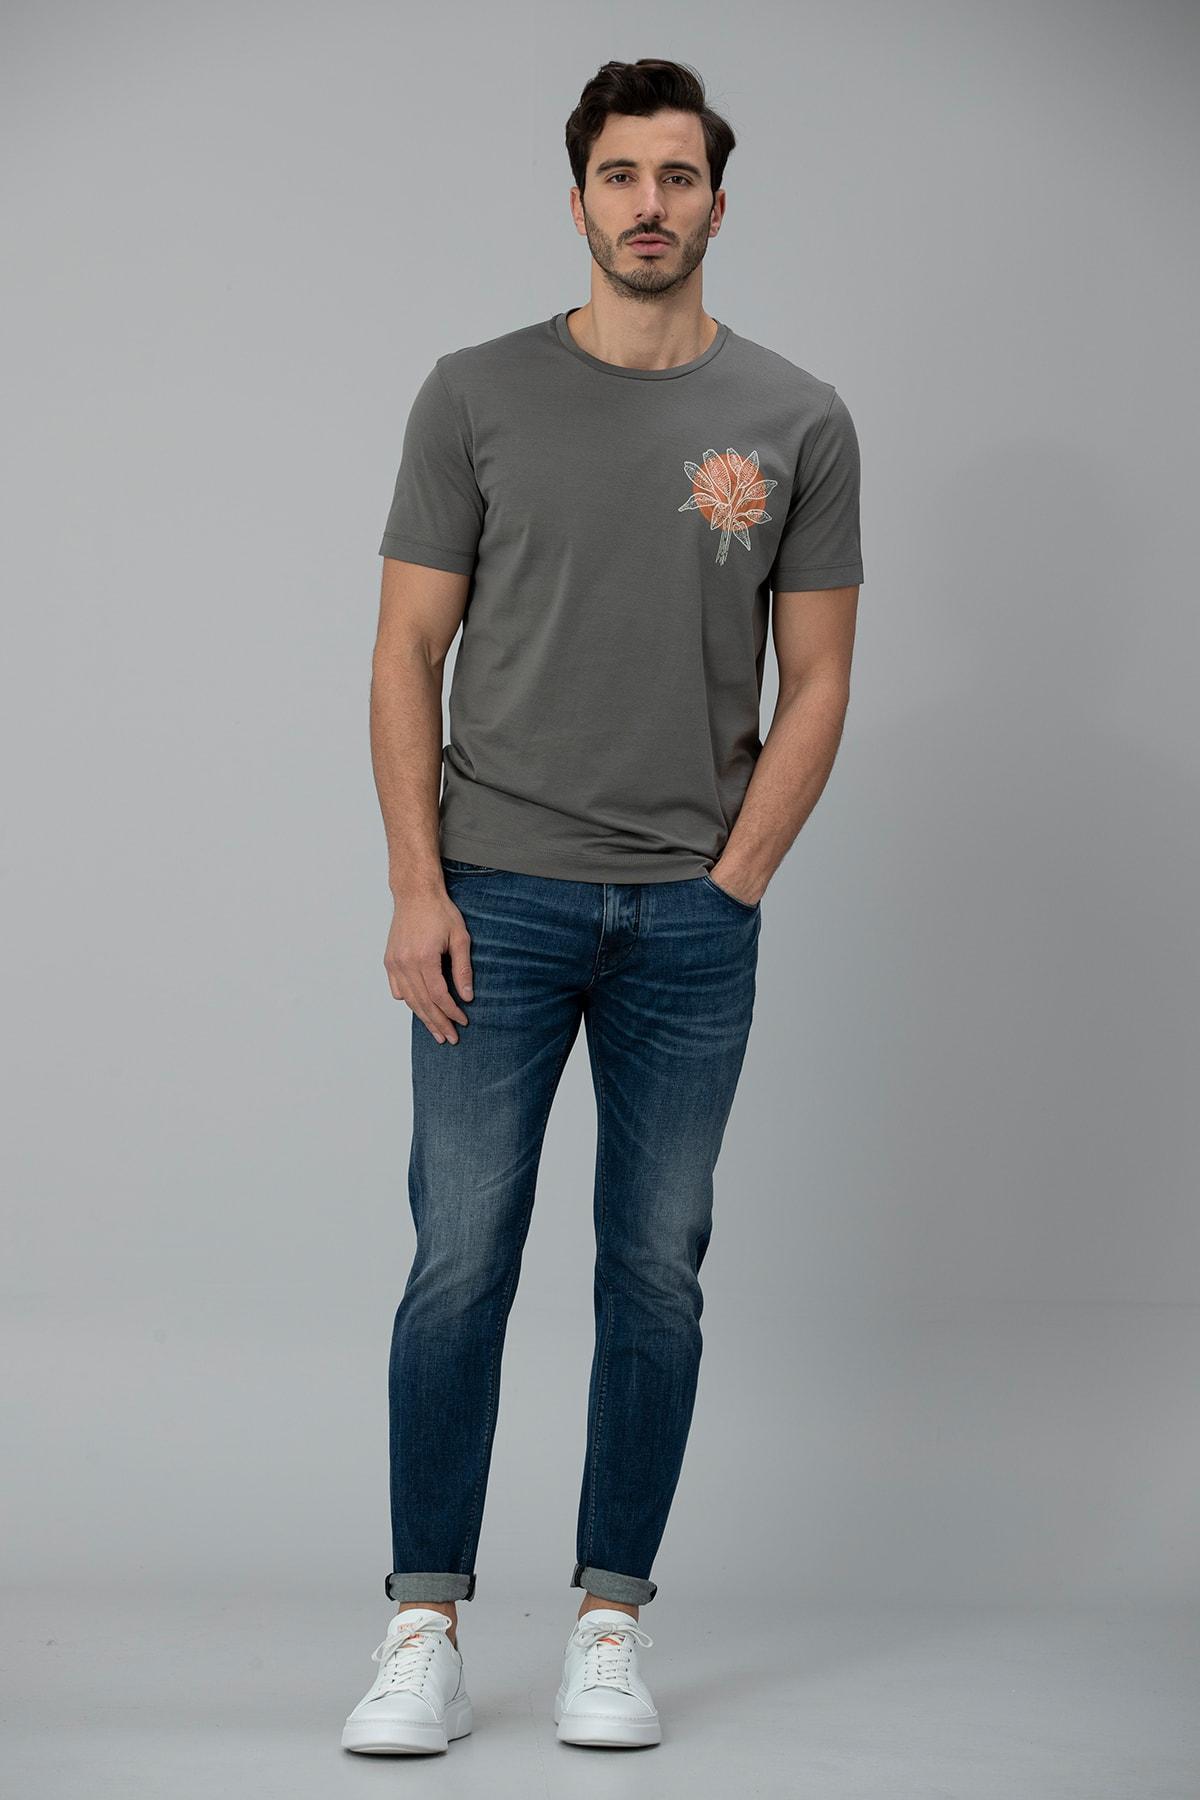 Lufian Aury Smart Jean Pantolon Slim Fit Koyu Mavi 0